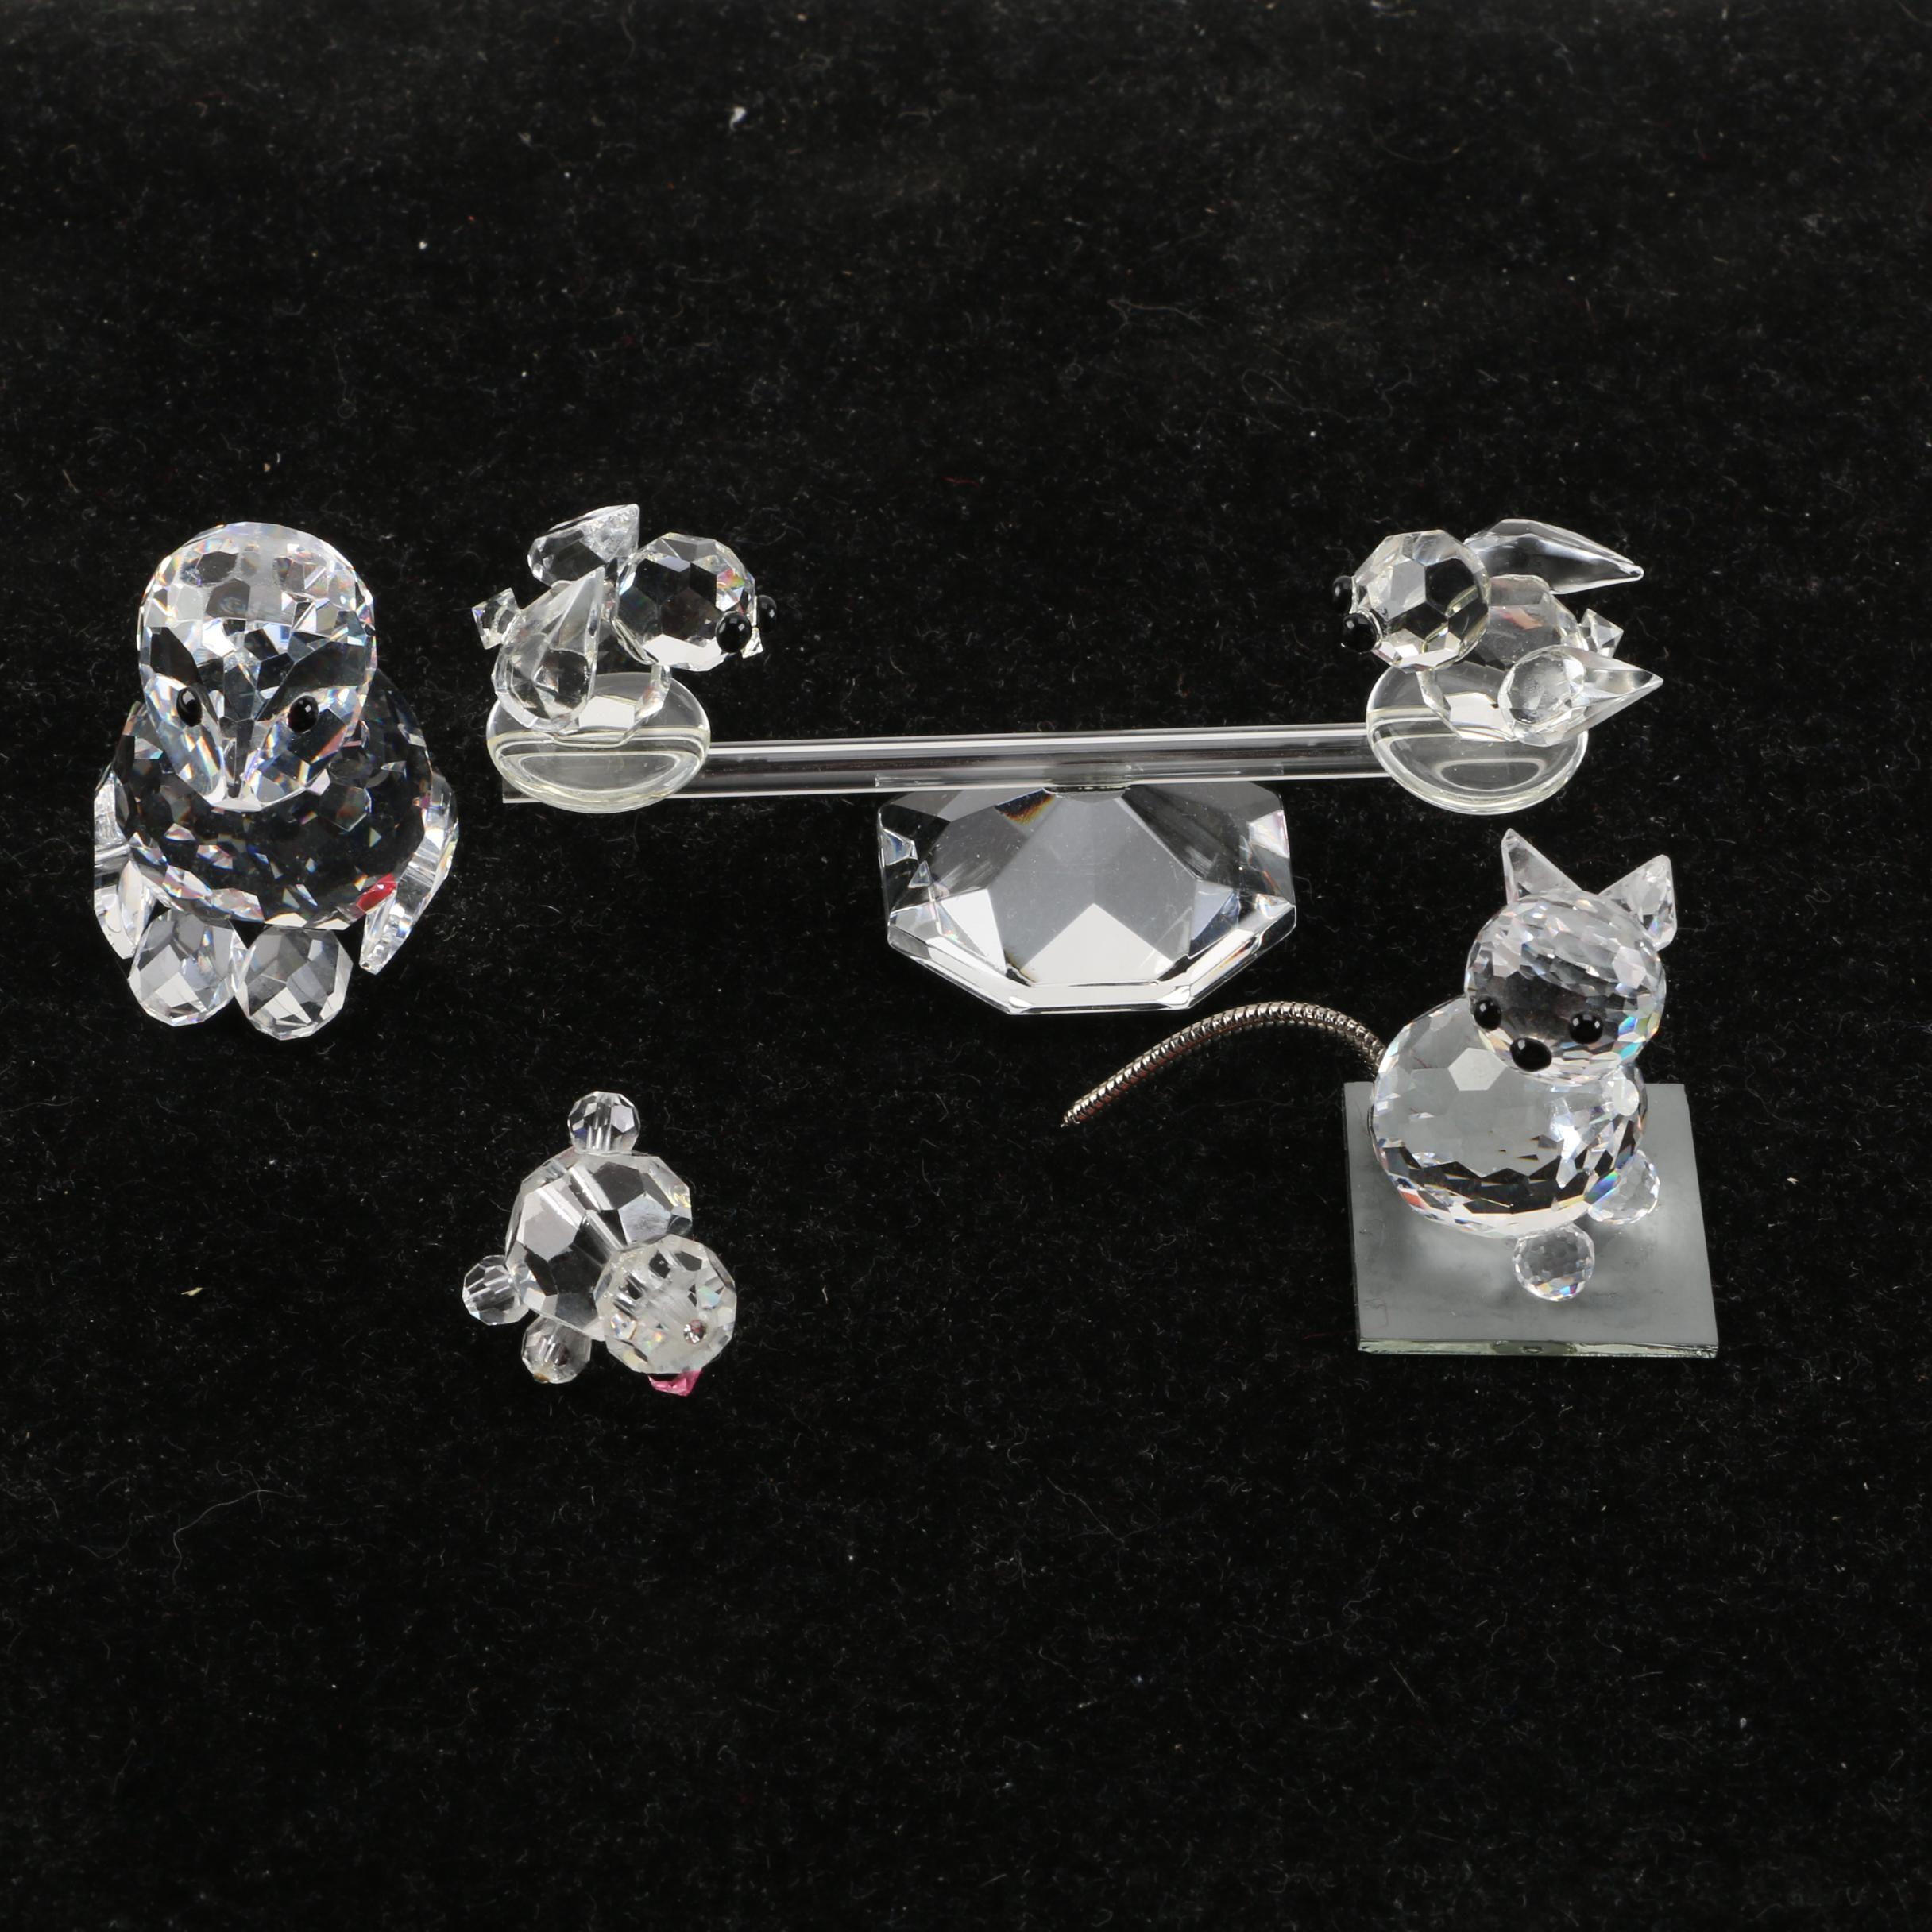 Miniature Cut Crystal Animal Figurines Including Swarovski